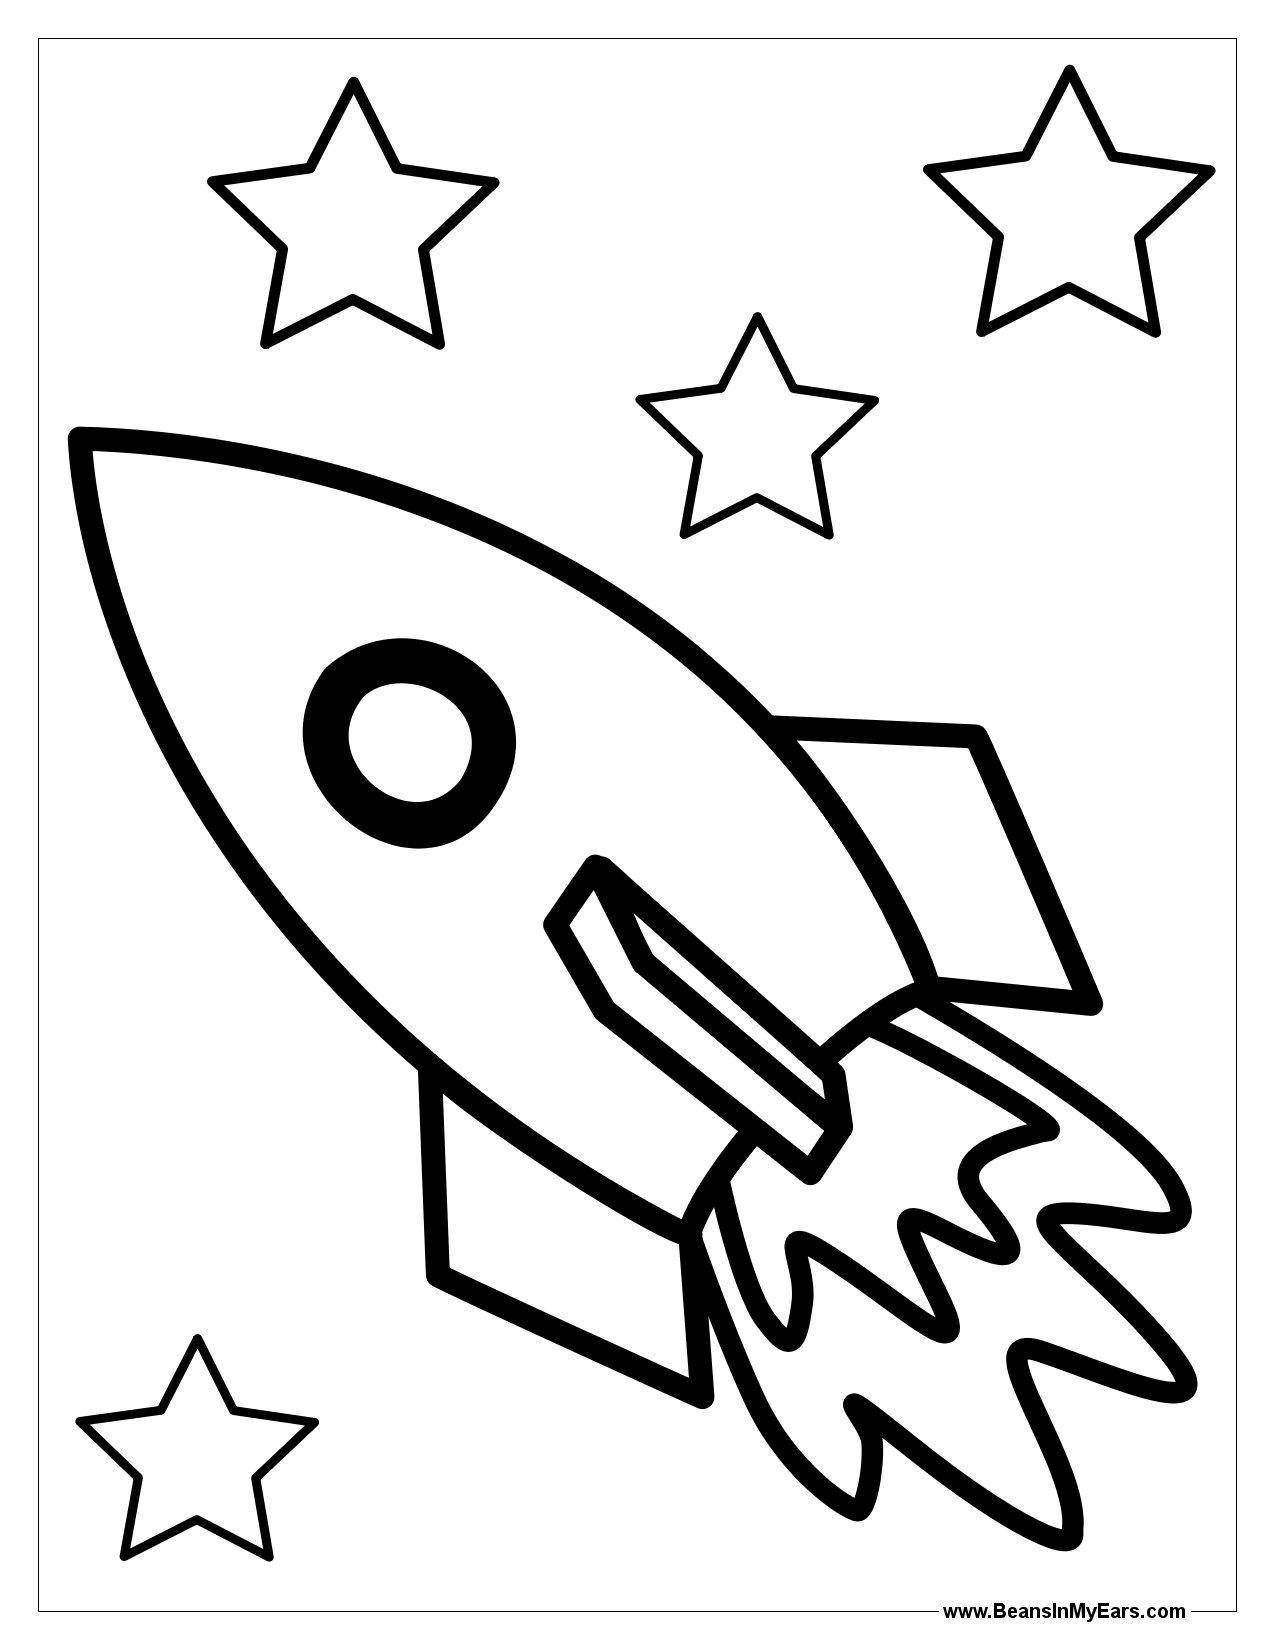 Rocket Ship Outline | Free download on ClipArtMag